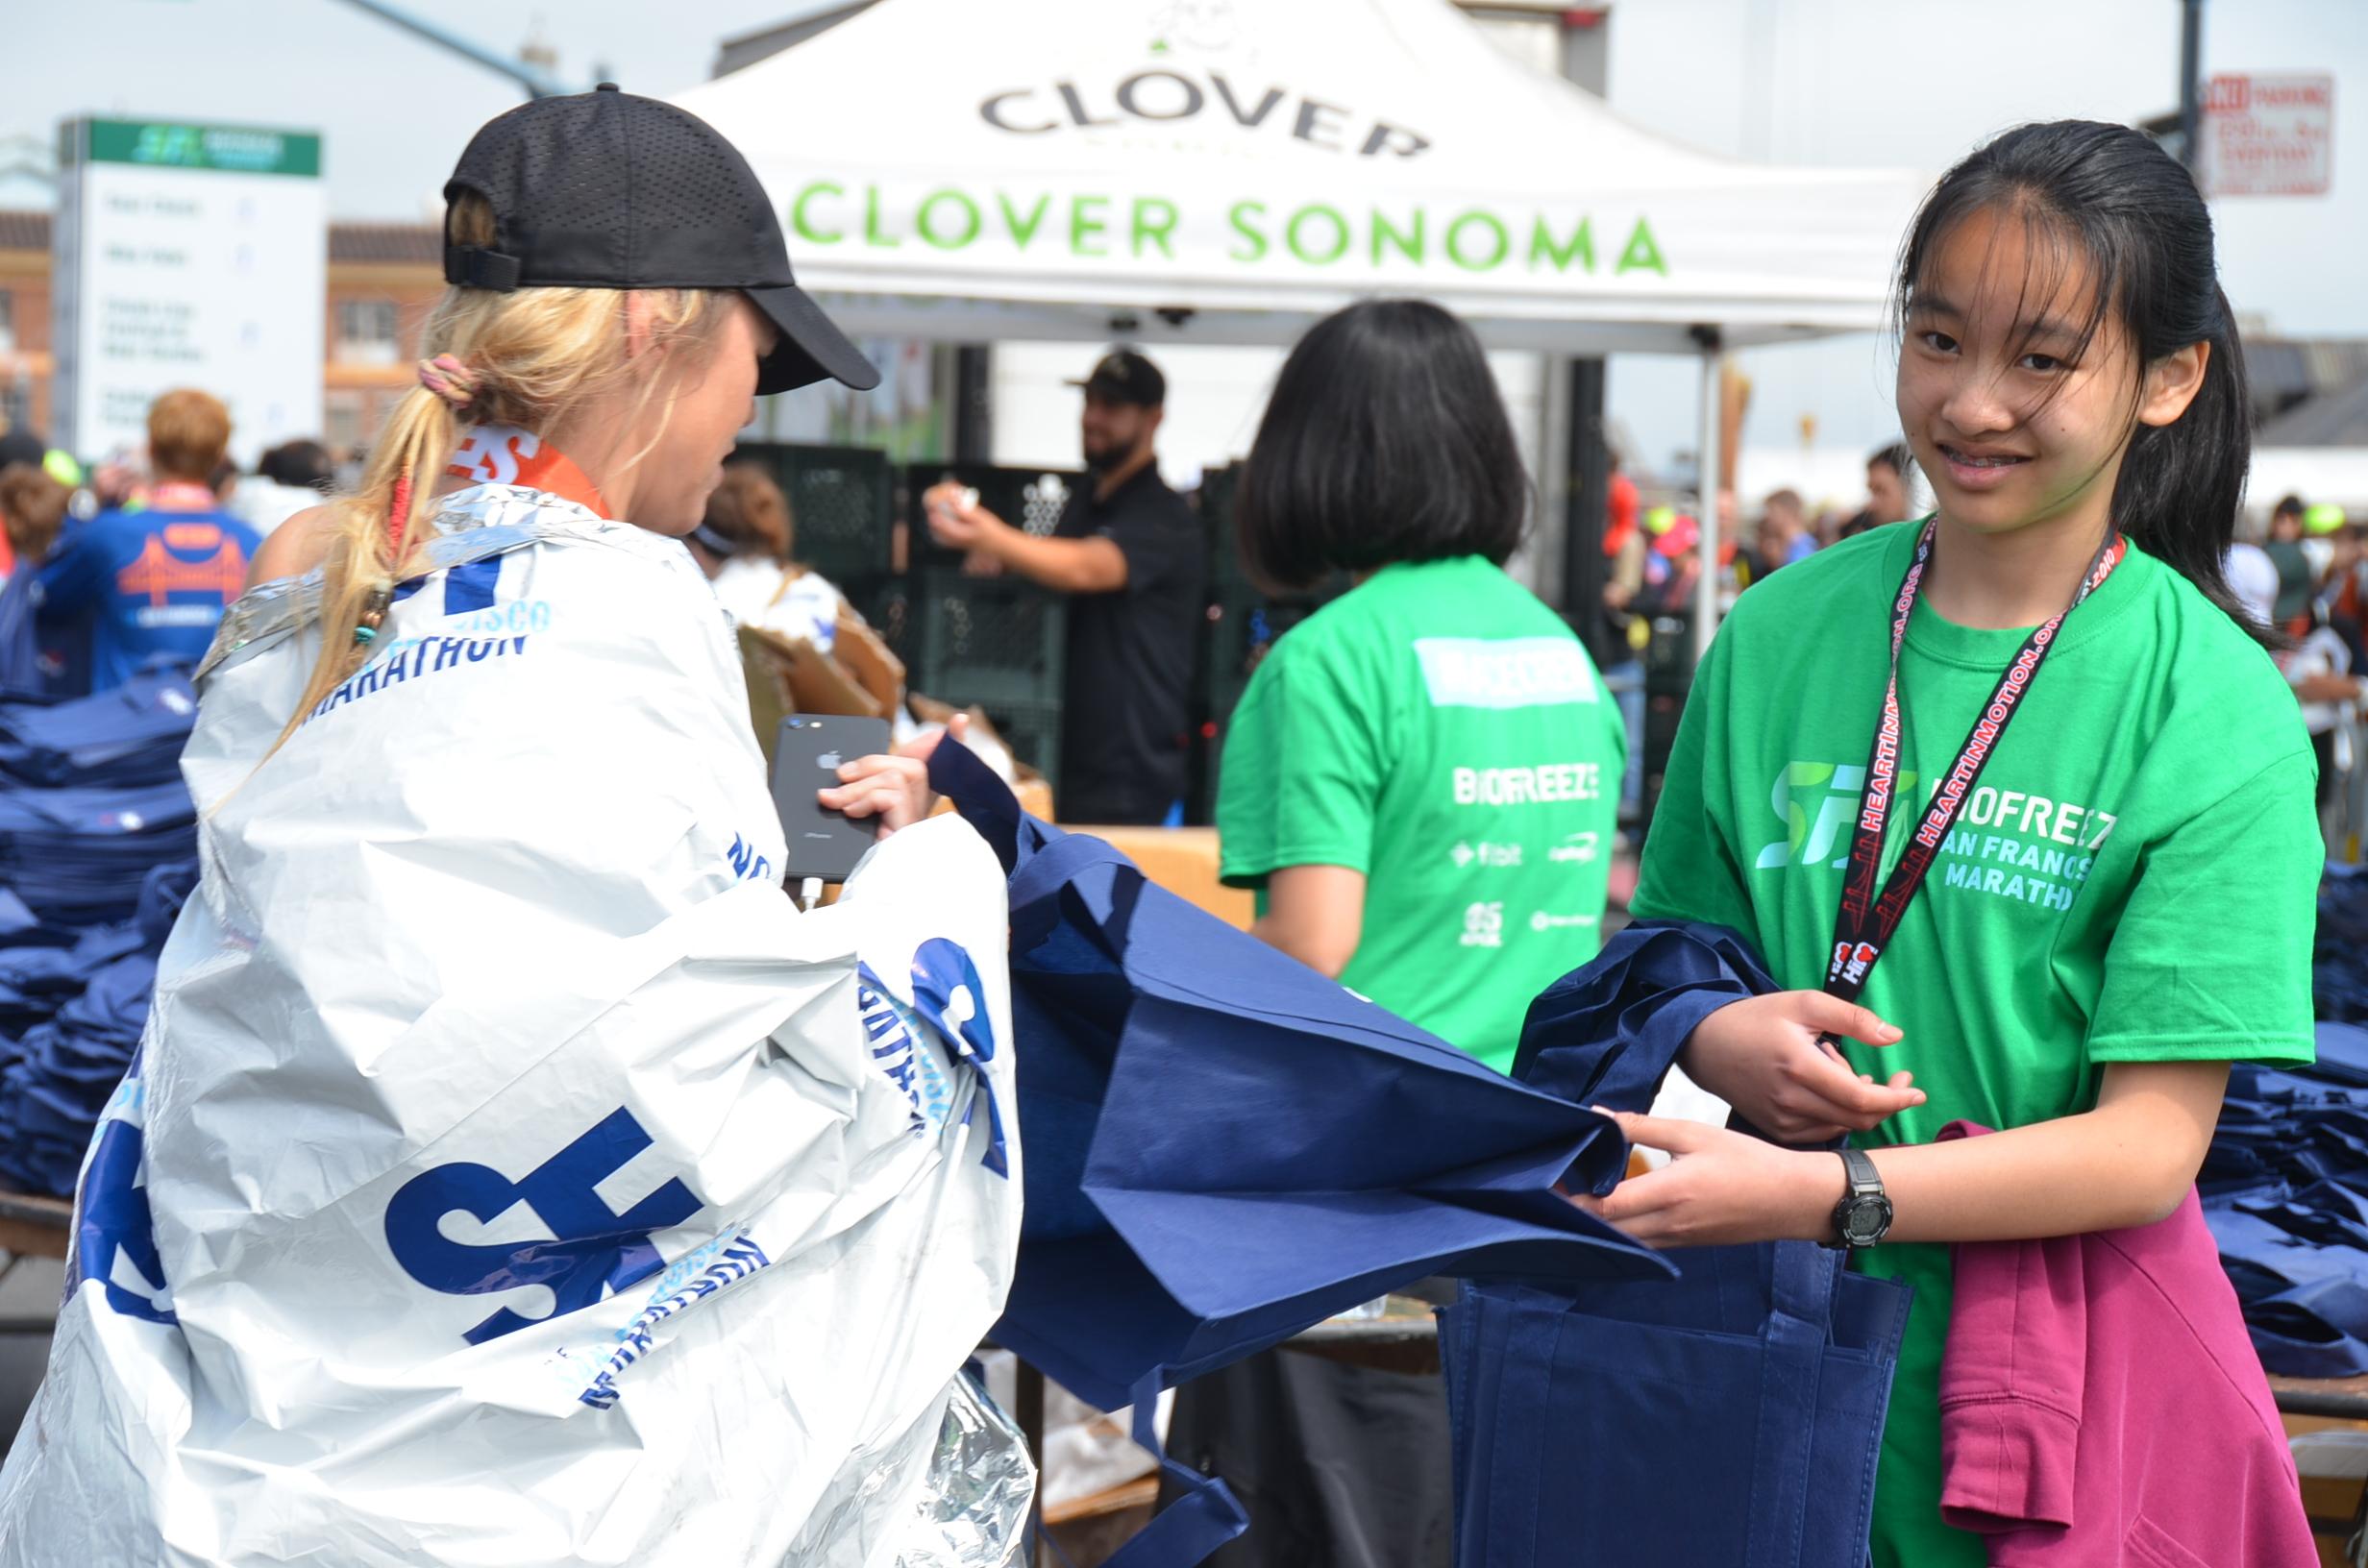 Community Service Organization: Volunteer at the Finish Line for SF Marathon on TeenLife